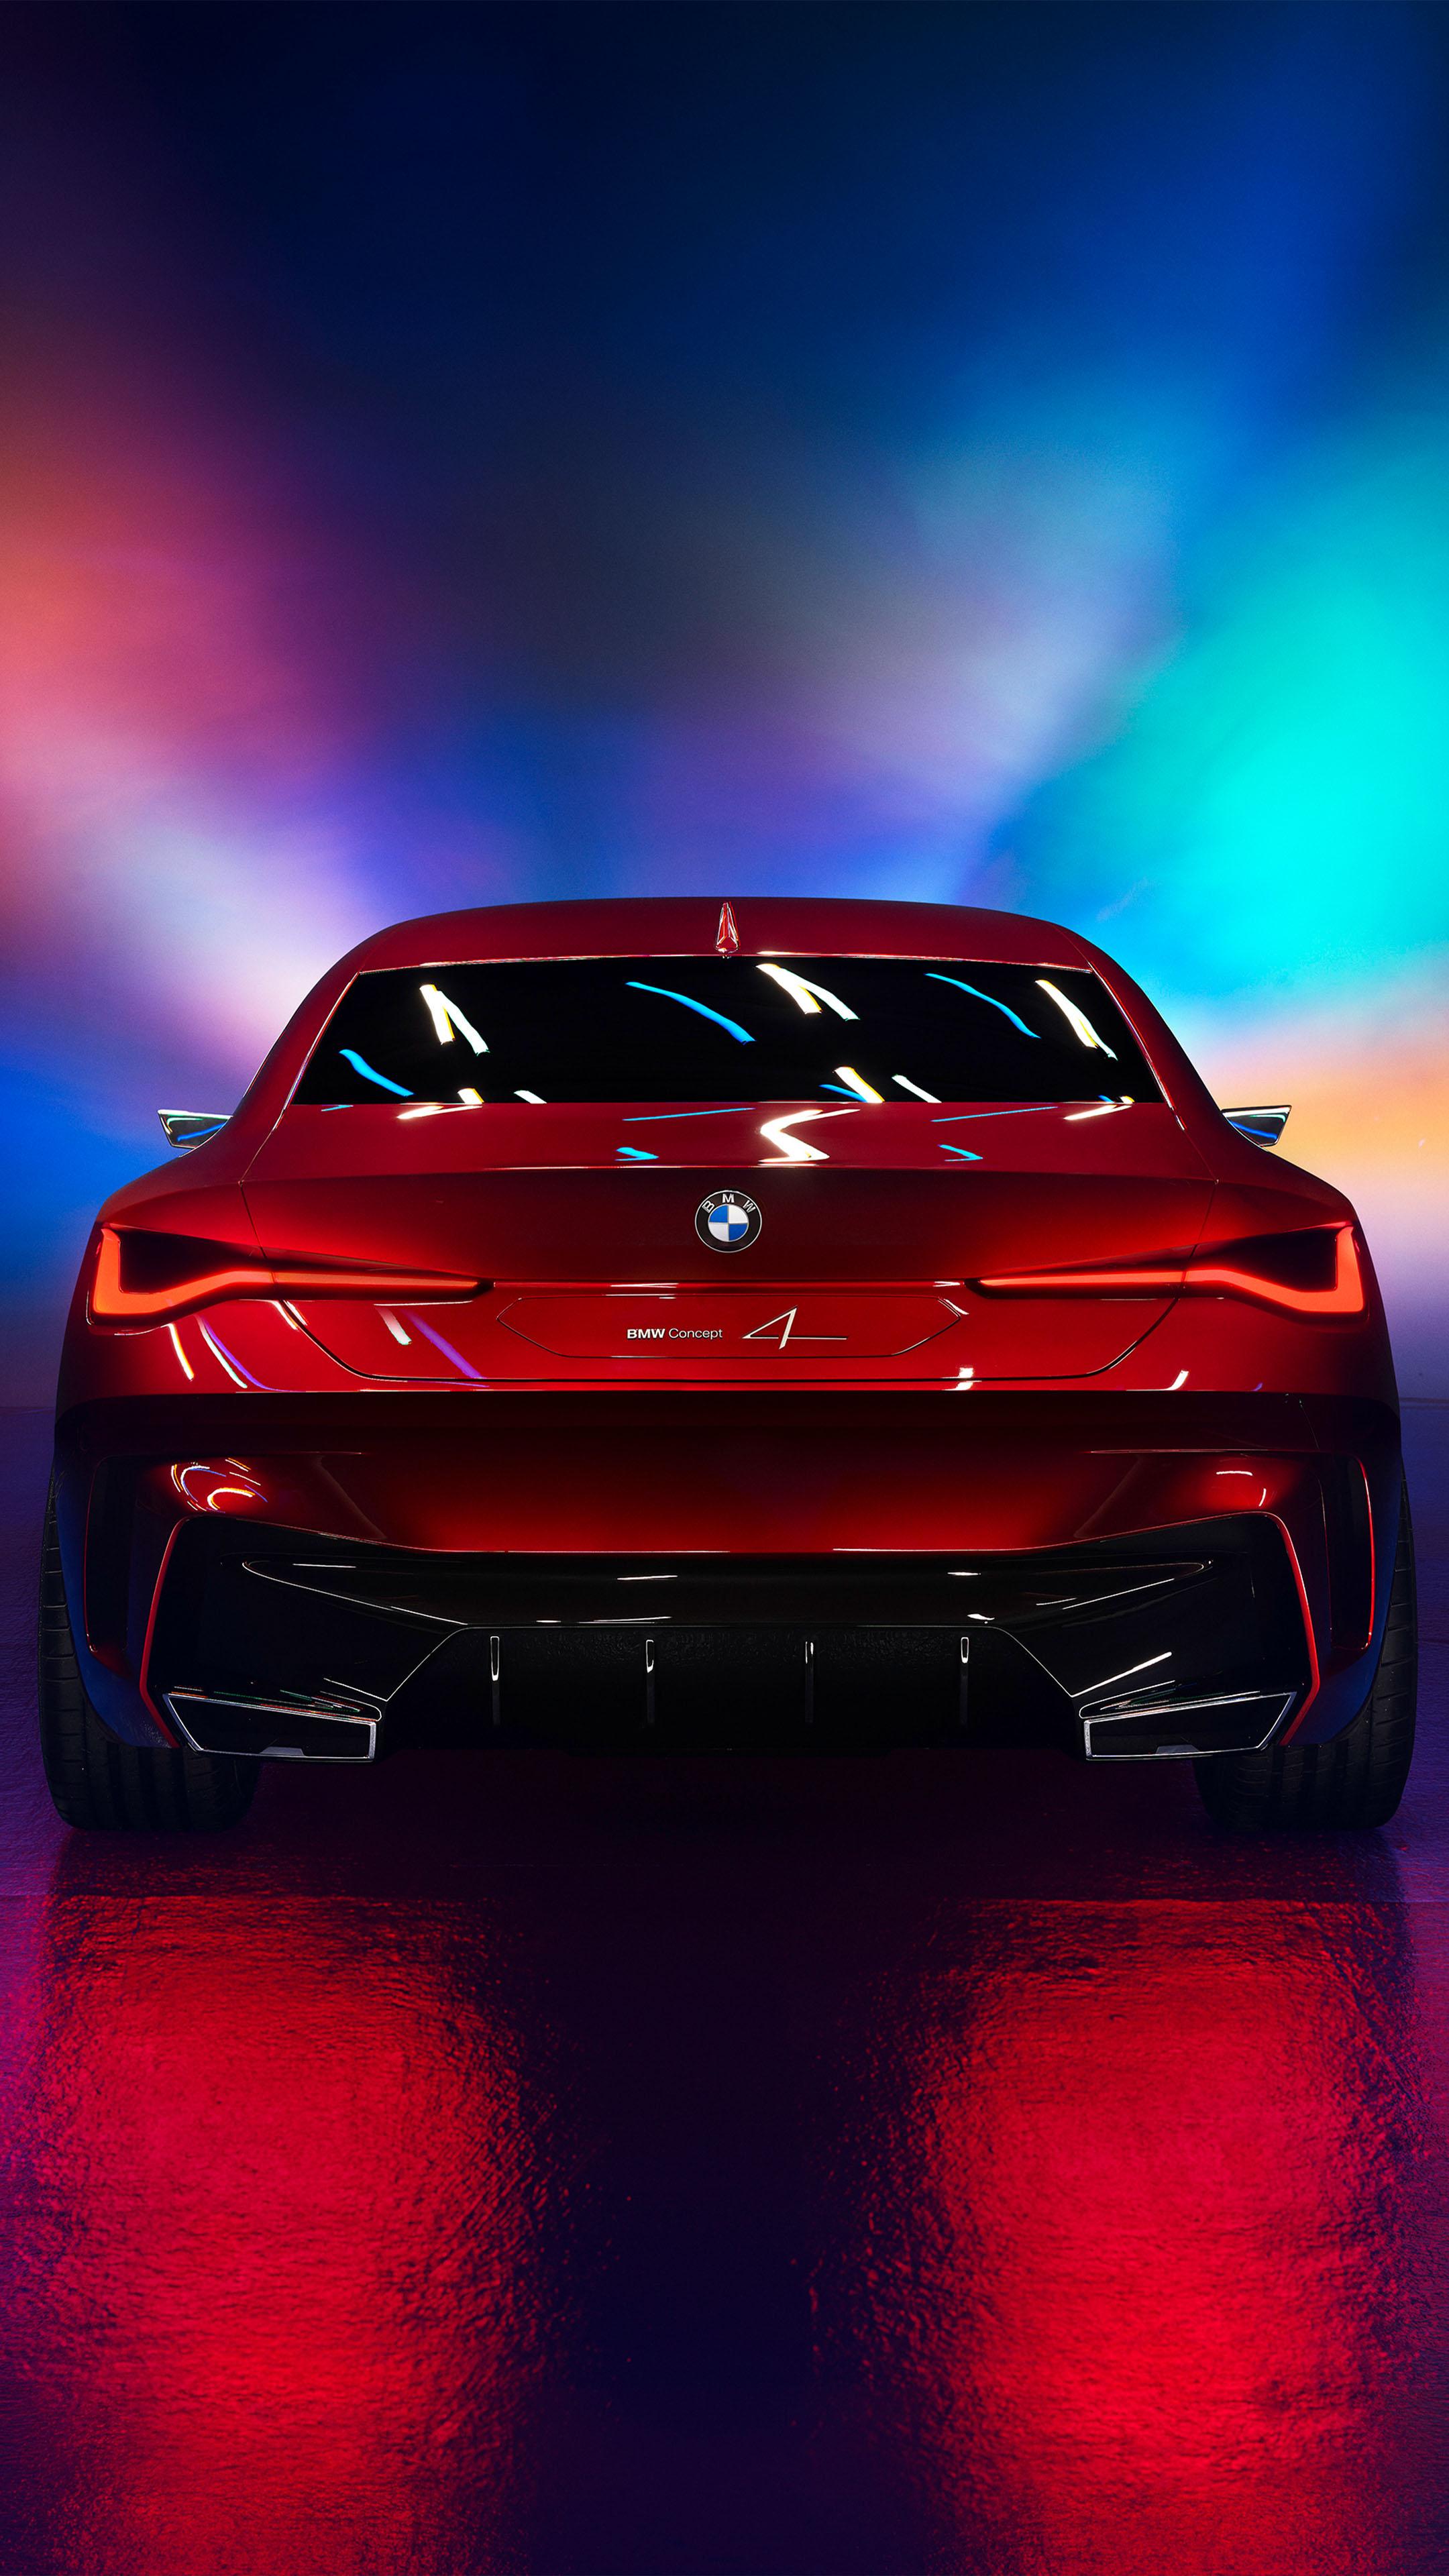 BMW Concept 4 2019 Free 4K Ultra HD Mobile Wallpaper